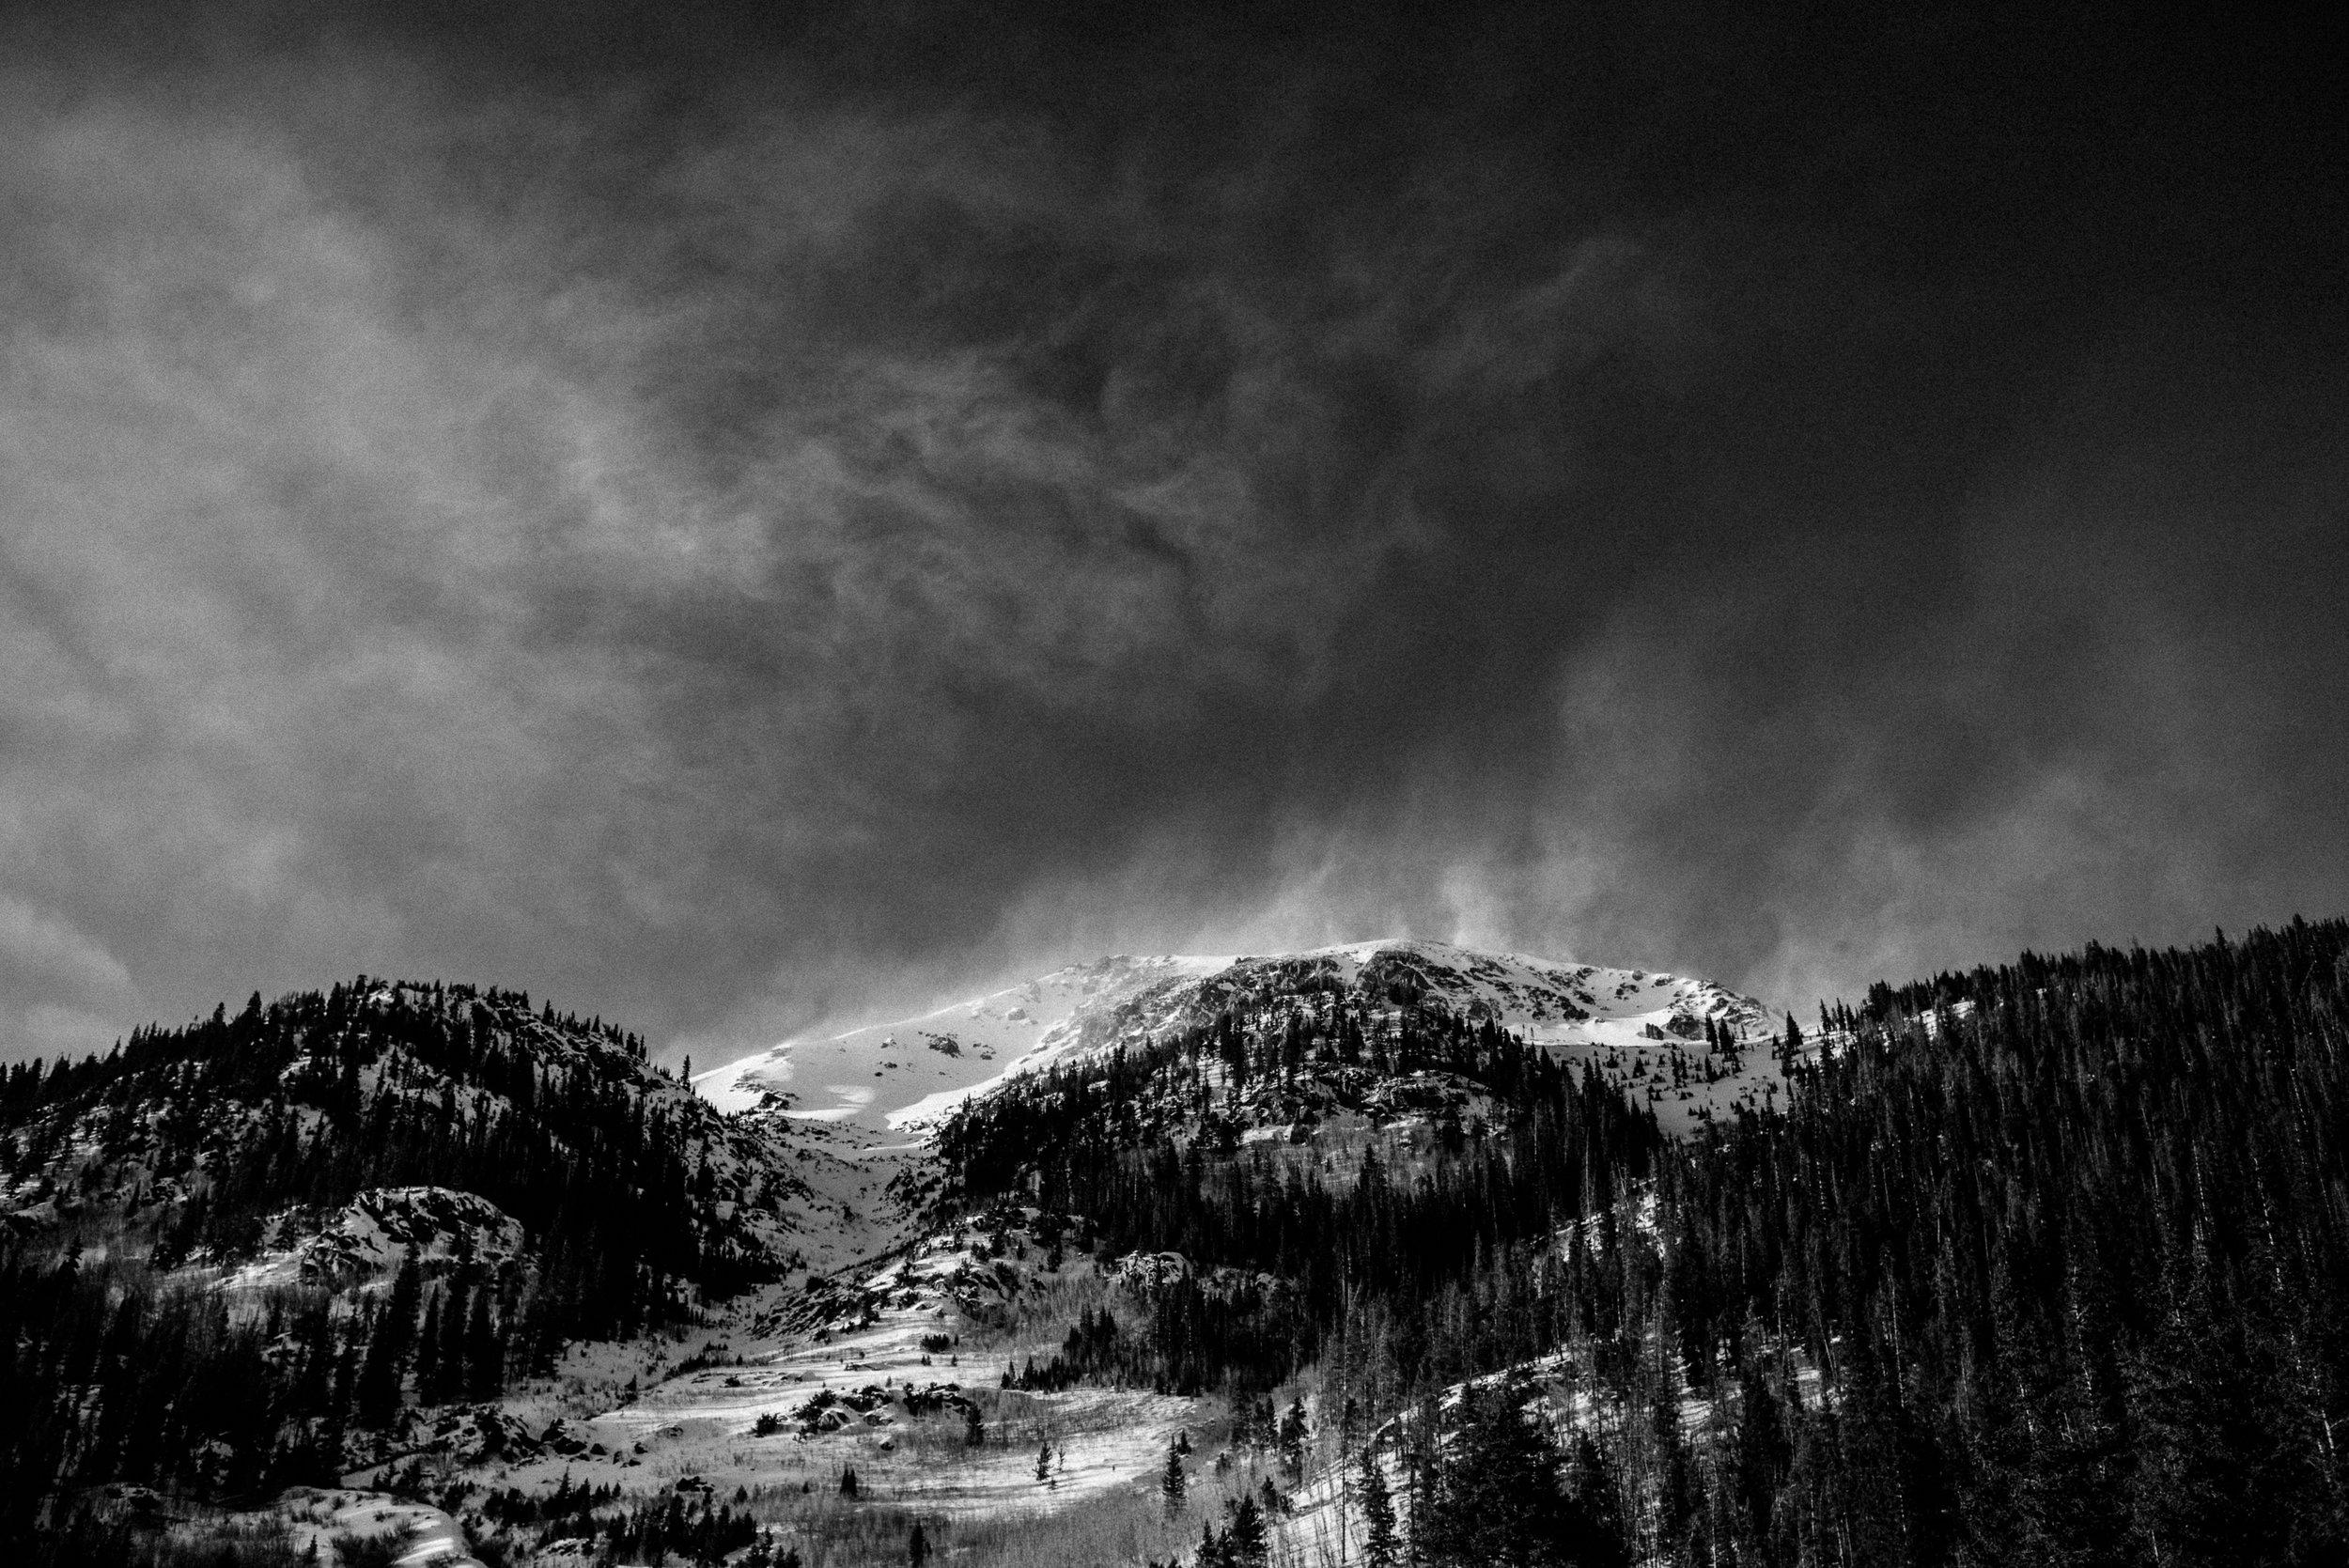 TaraShupe_Outdoor_Photographer_Loweprobags_Colorado_Copper_Mountains_Ski_02.jpg